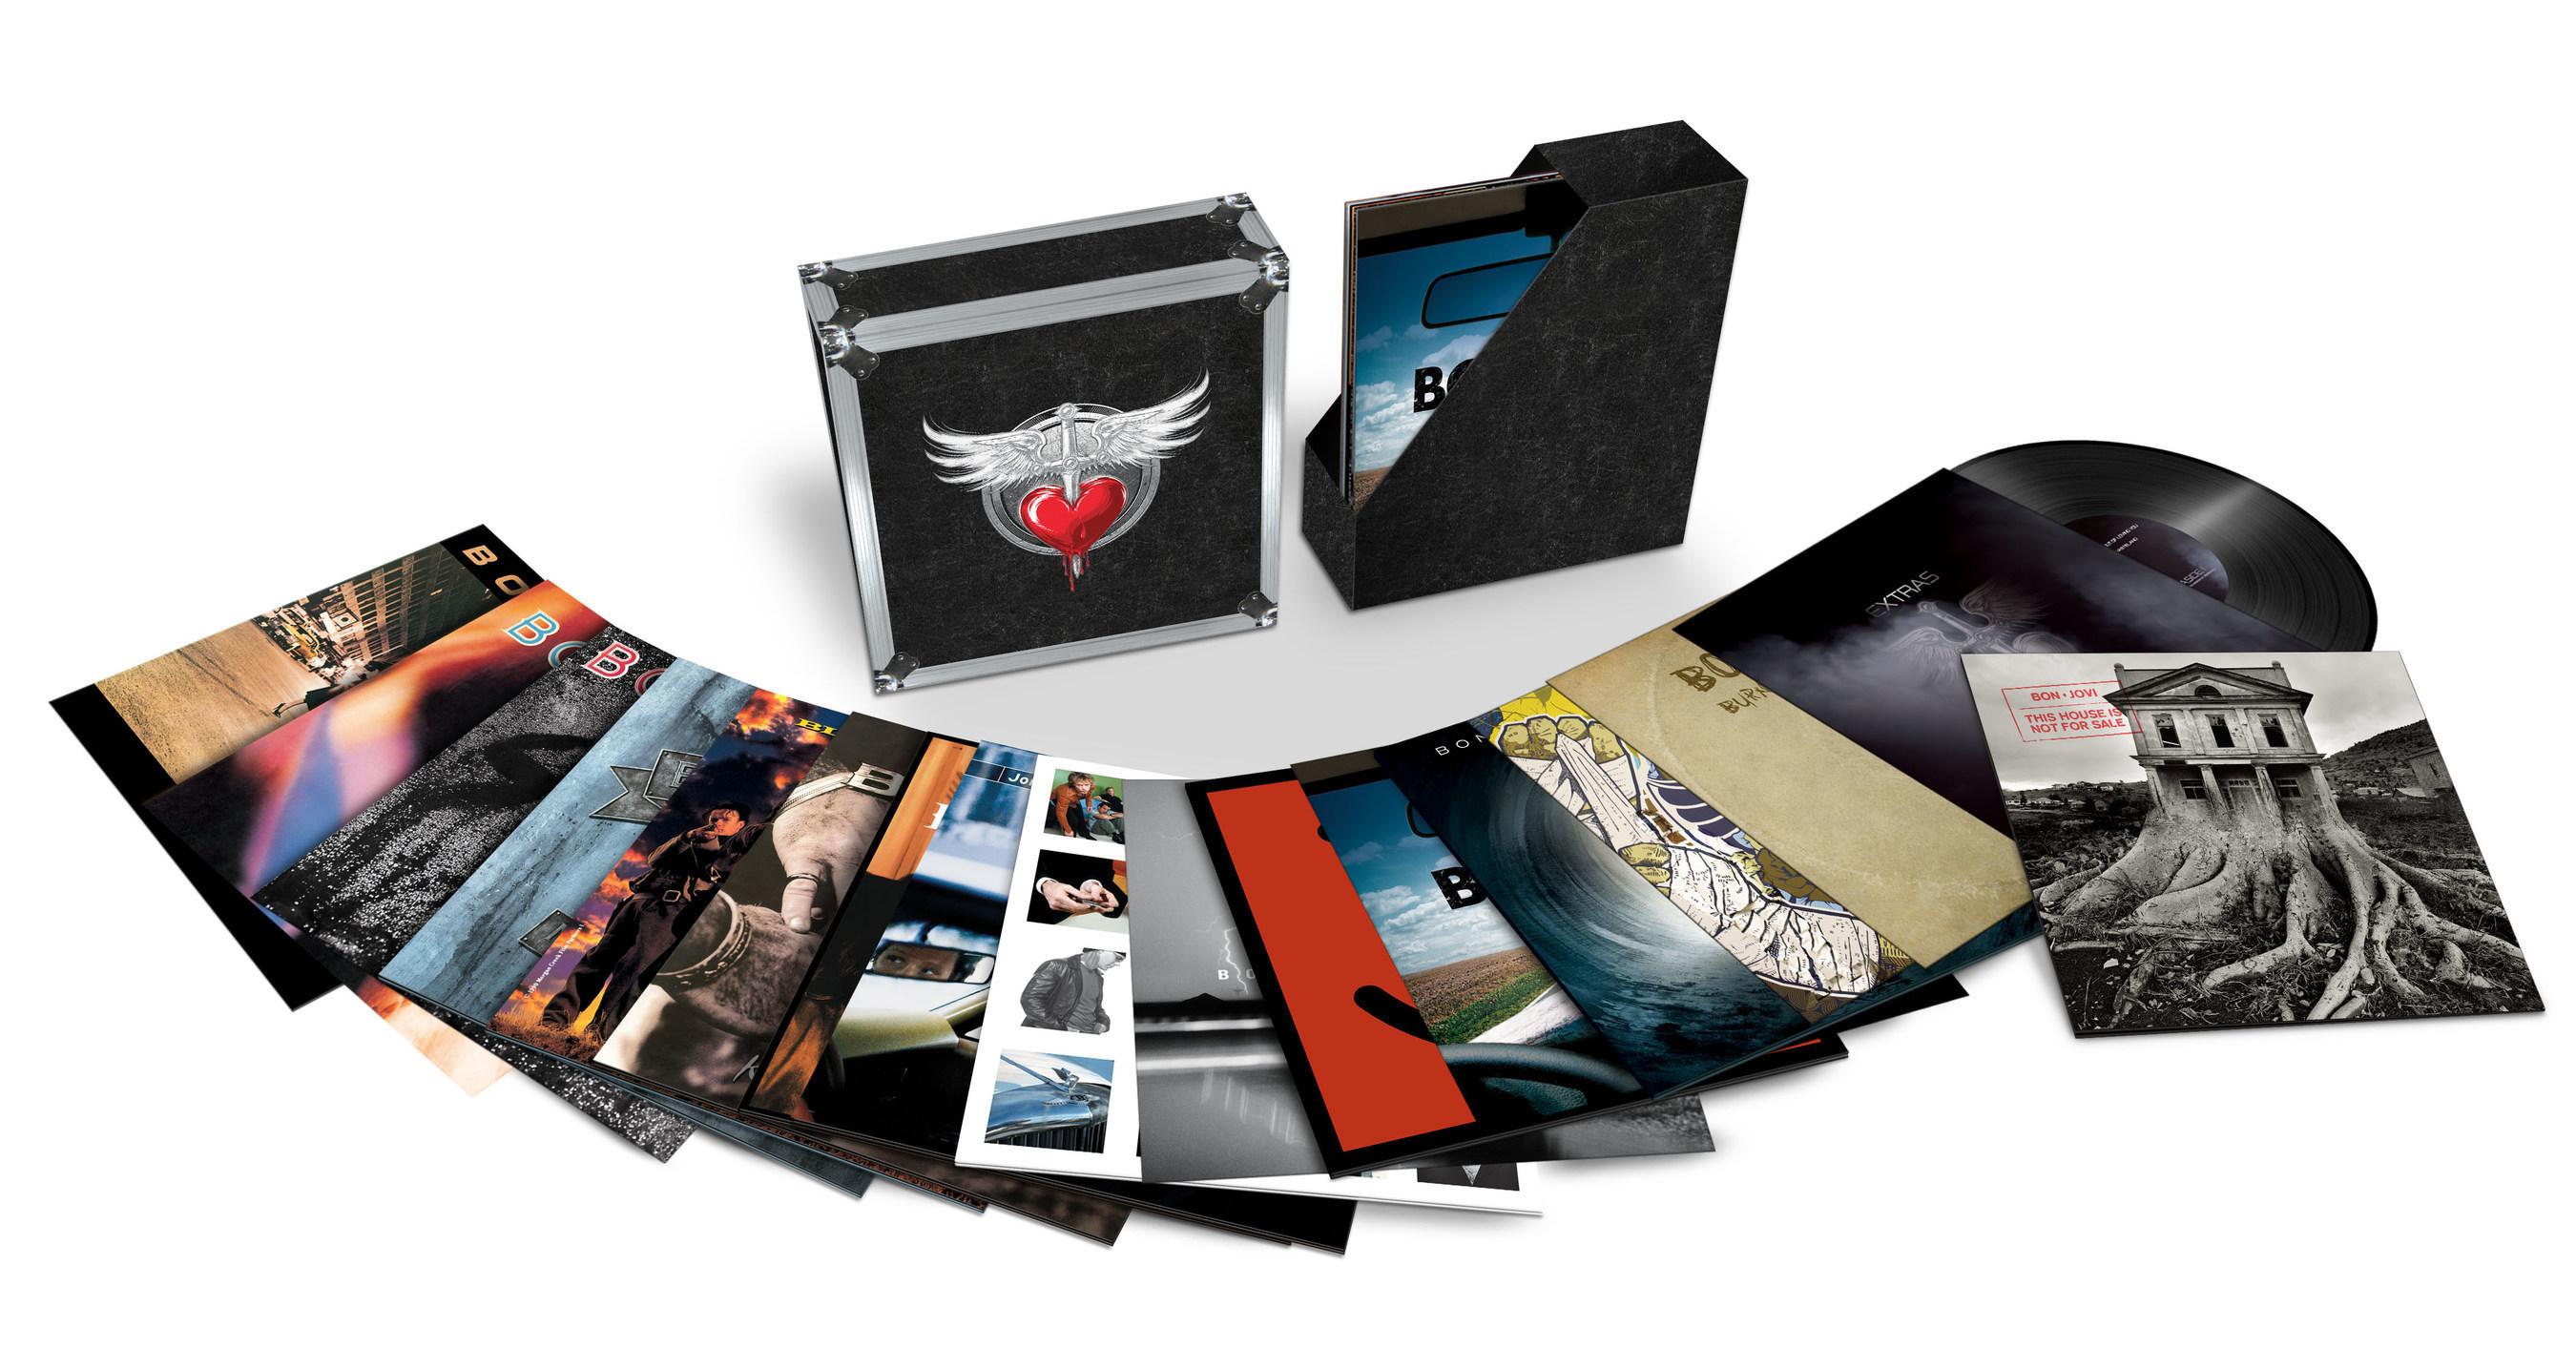 Bon Jovi's Massive, Career-Spanning, 17-Album Vinyl Box Set, 'Bon Jovi: The Albums,' Can Be Pre-ordered Now For Its February 2017 Release